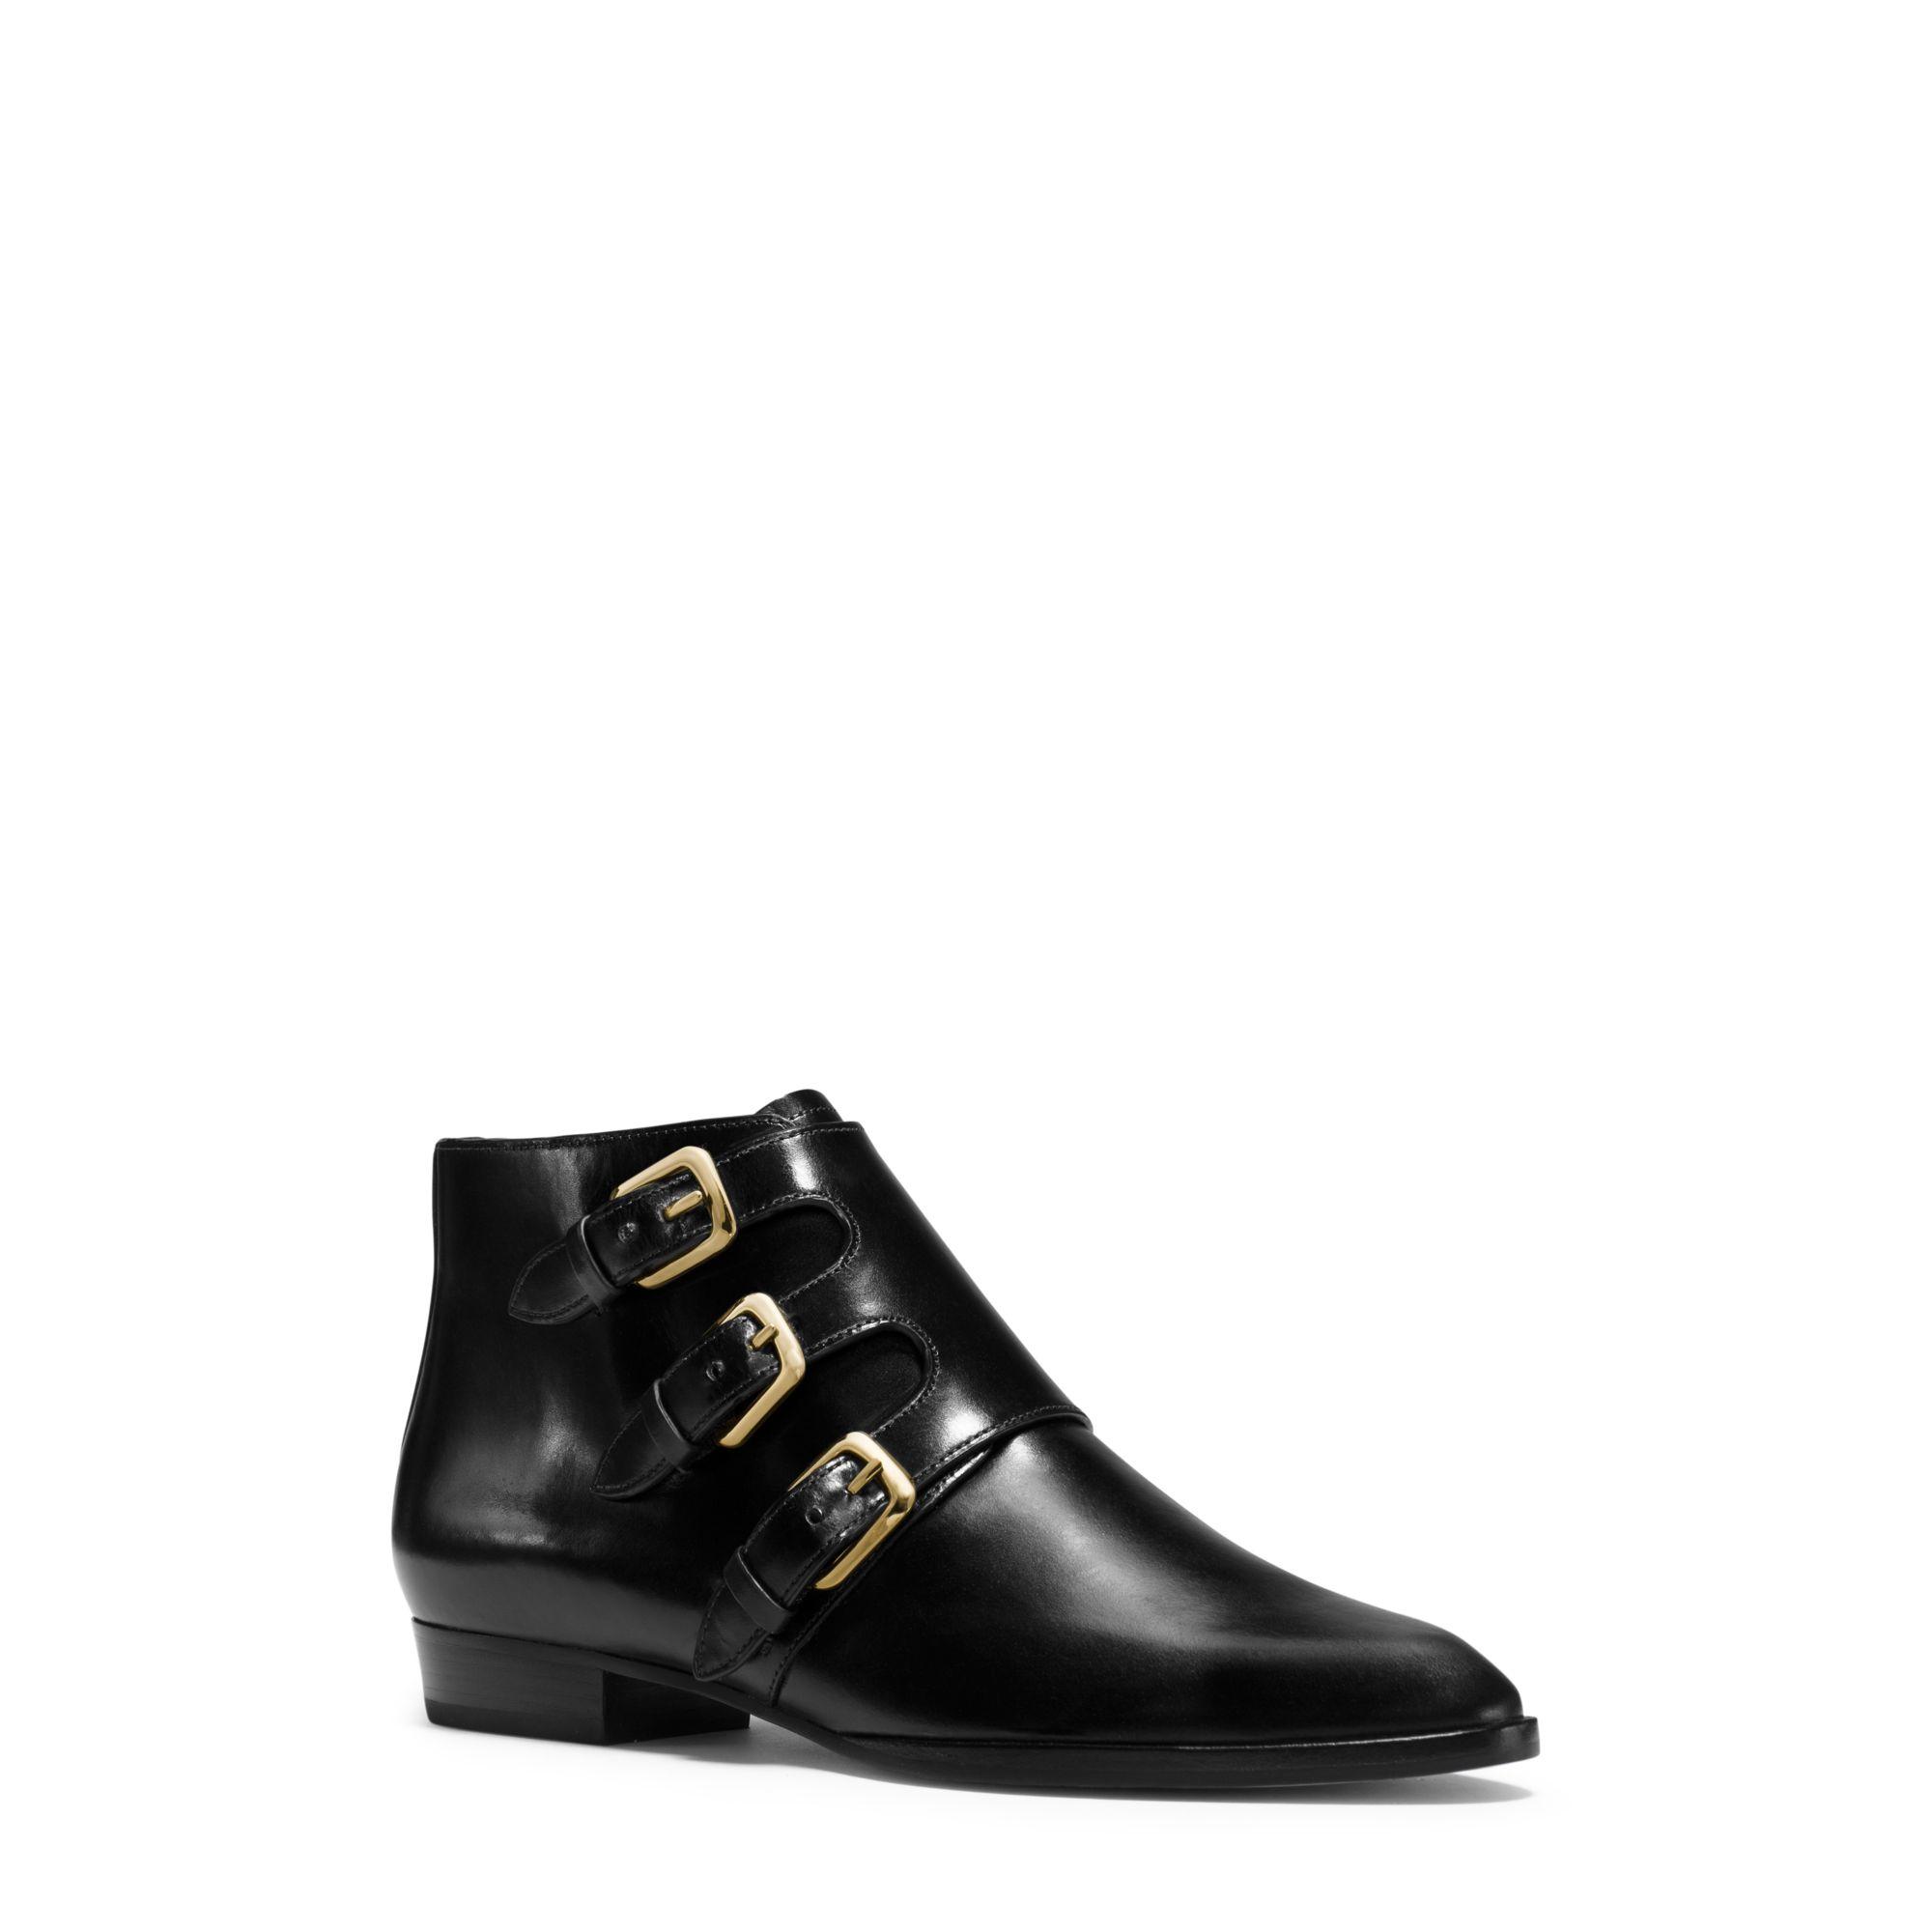 michael kors prudence leather ankle boot in black lyst. Black Bedroom Furniture Sets. Home Design Ideas